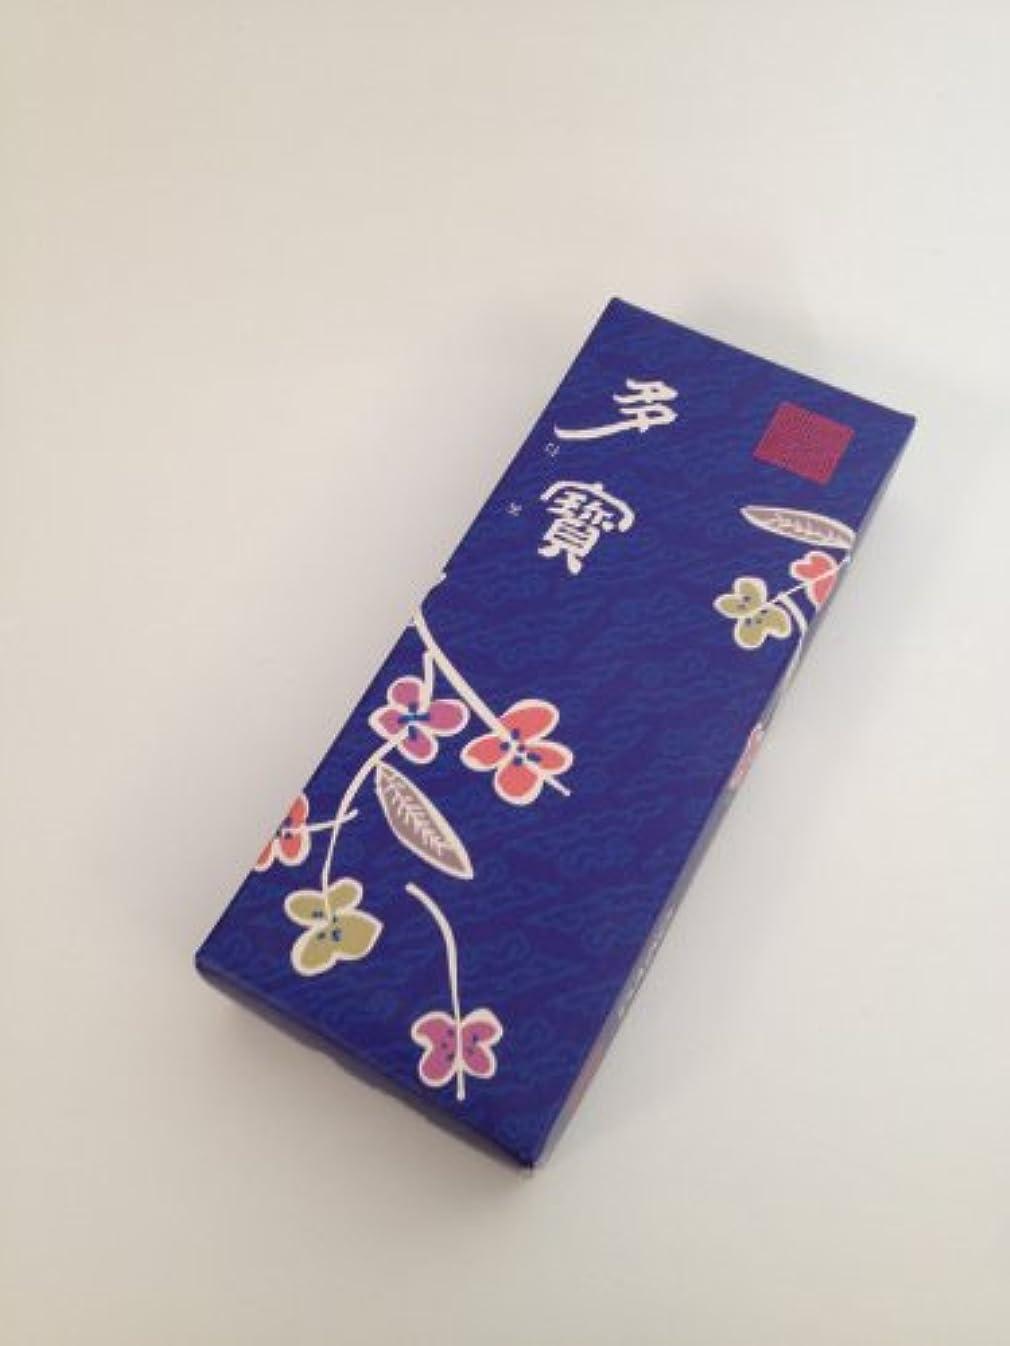 強制的強制的事実上Temple Incense Dabo ( Many Treasures ) Oriental Incense 120 Sticks